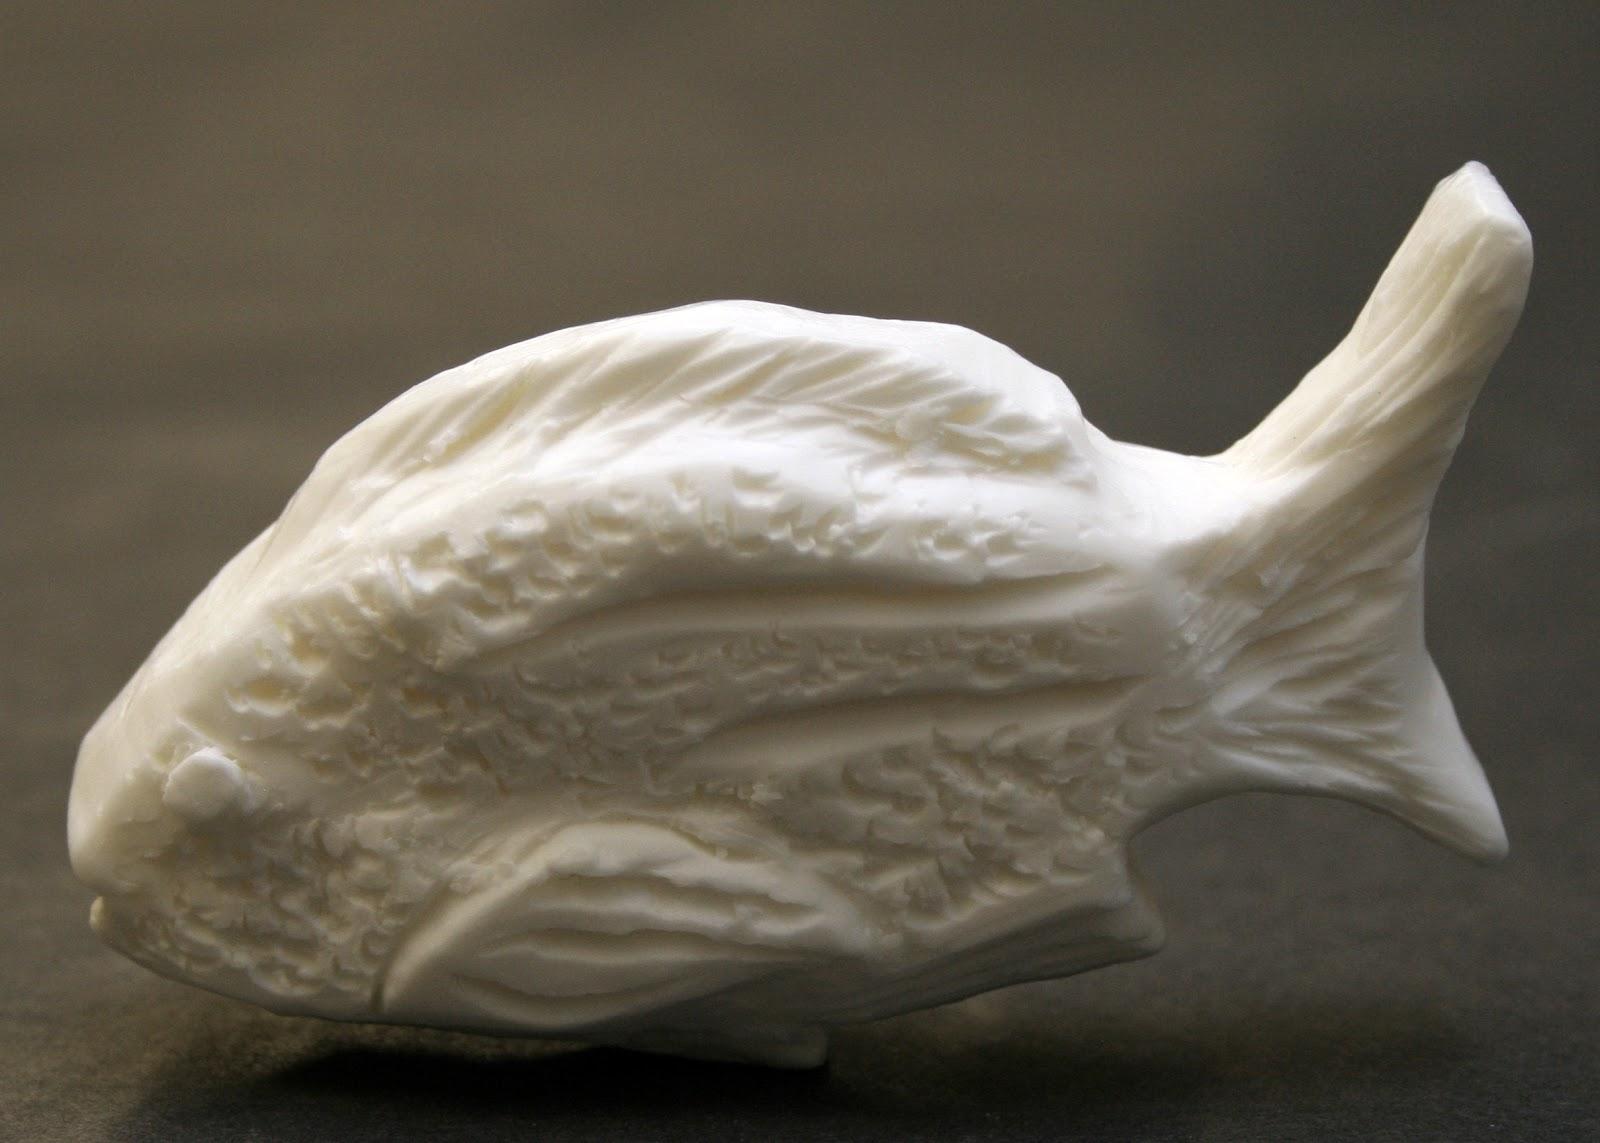 Nwsa art d comprehensive soap carving crit movember